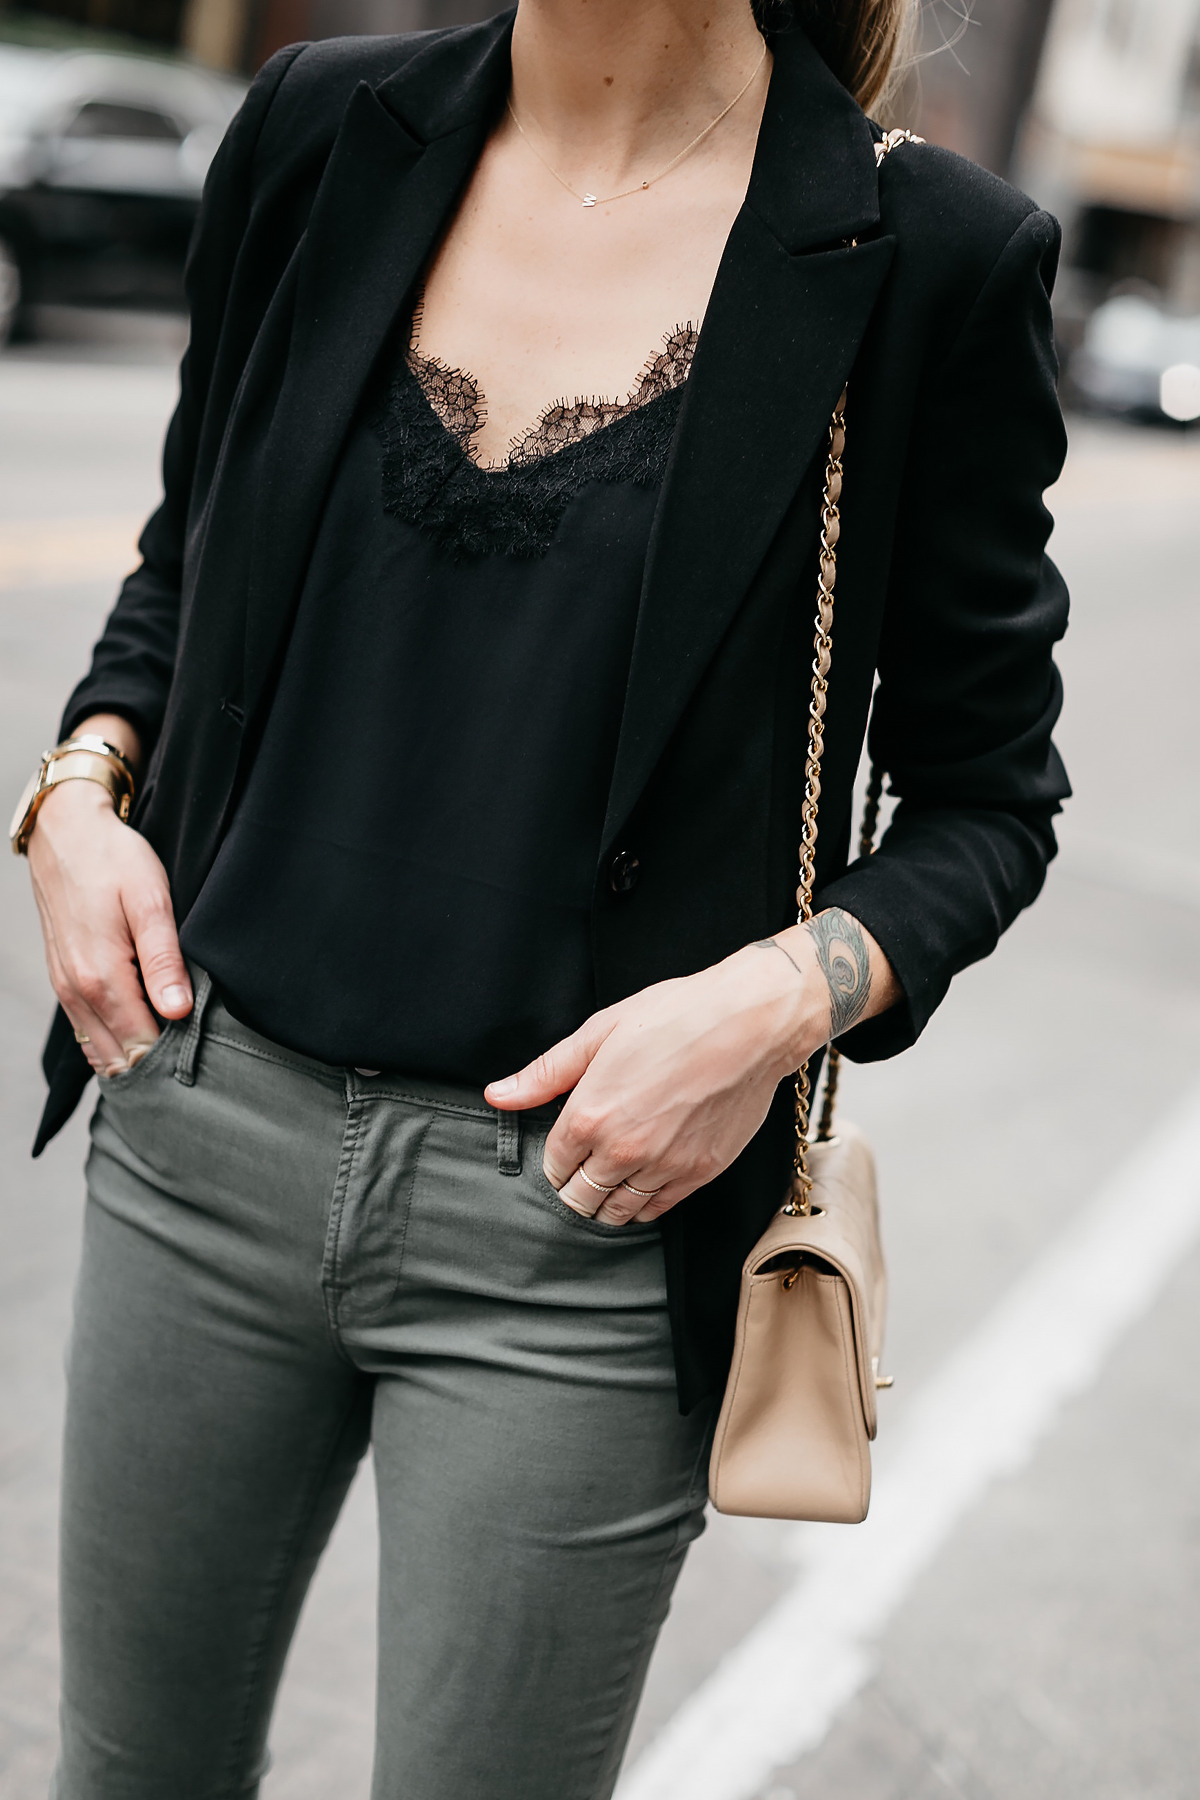 Woman Wearing Black Lace Cami Black Blazer Olive Green Jeans Fashion Jackson Dallas Blogger Fashion Blogger Street Style